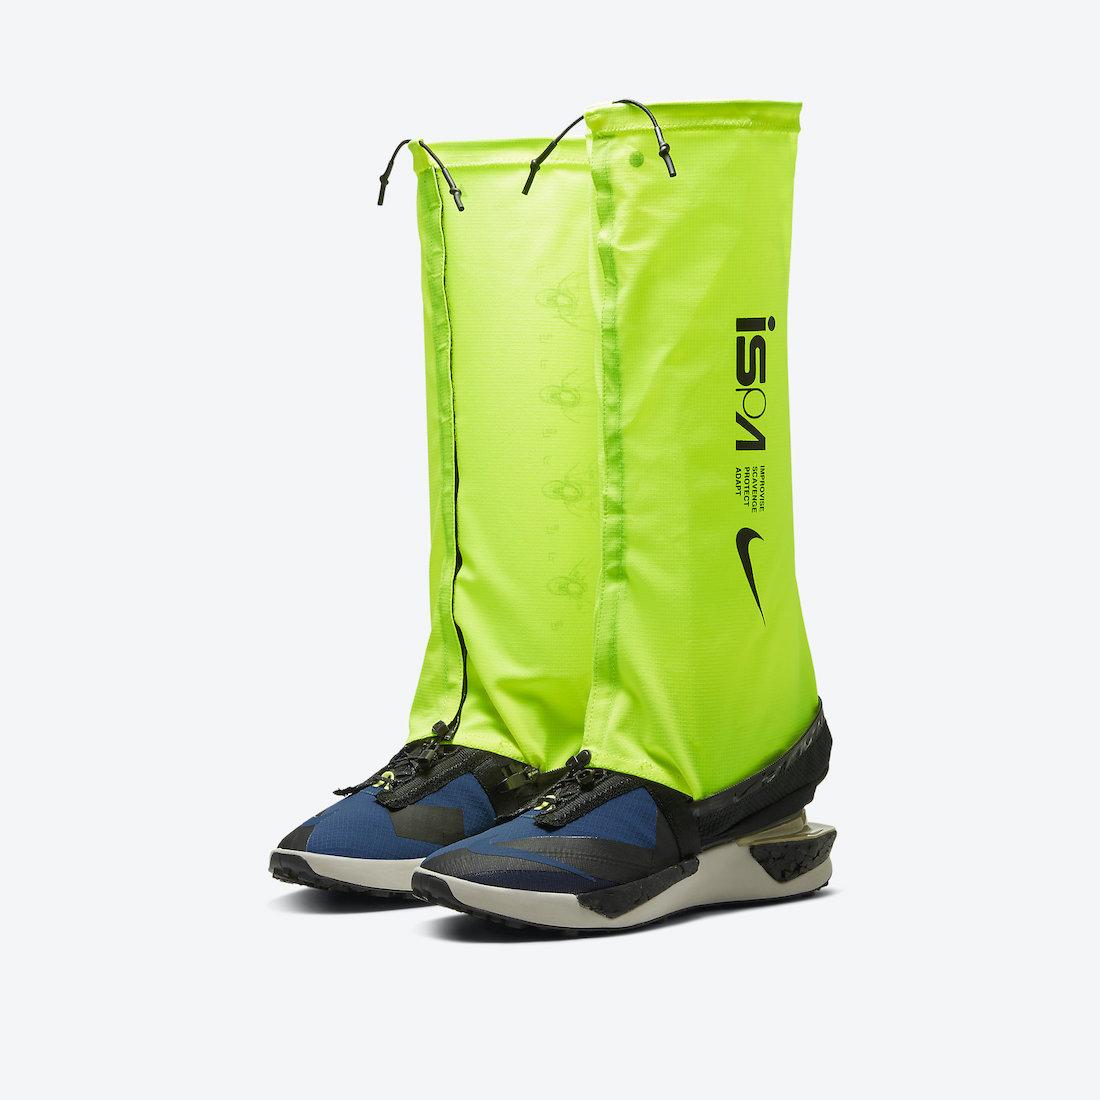 Nike Drifter Gator ISPA Coastal Blue CI1392-400 Release Date Info